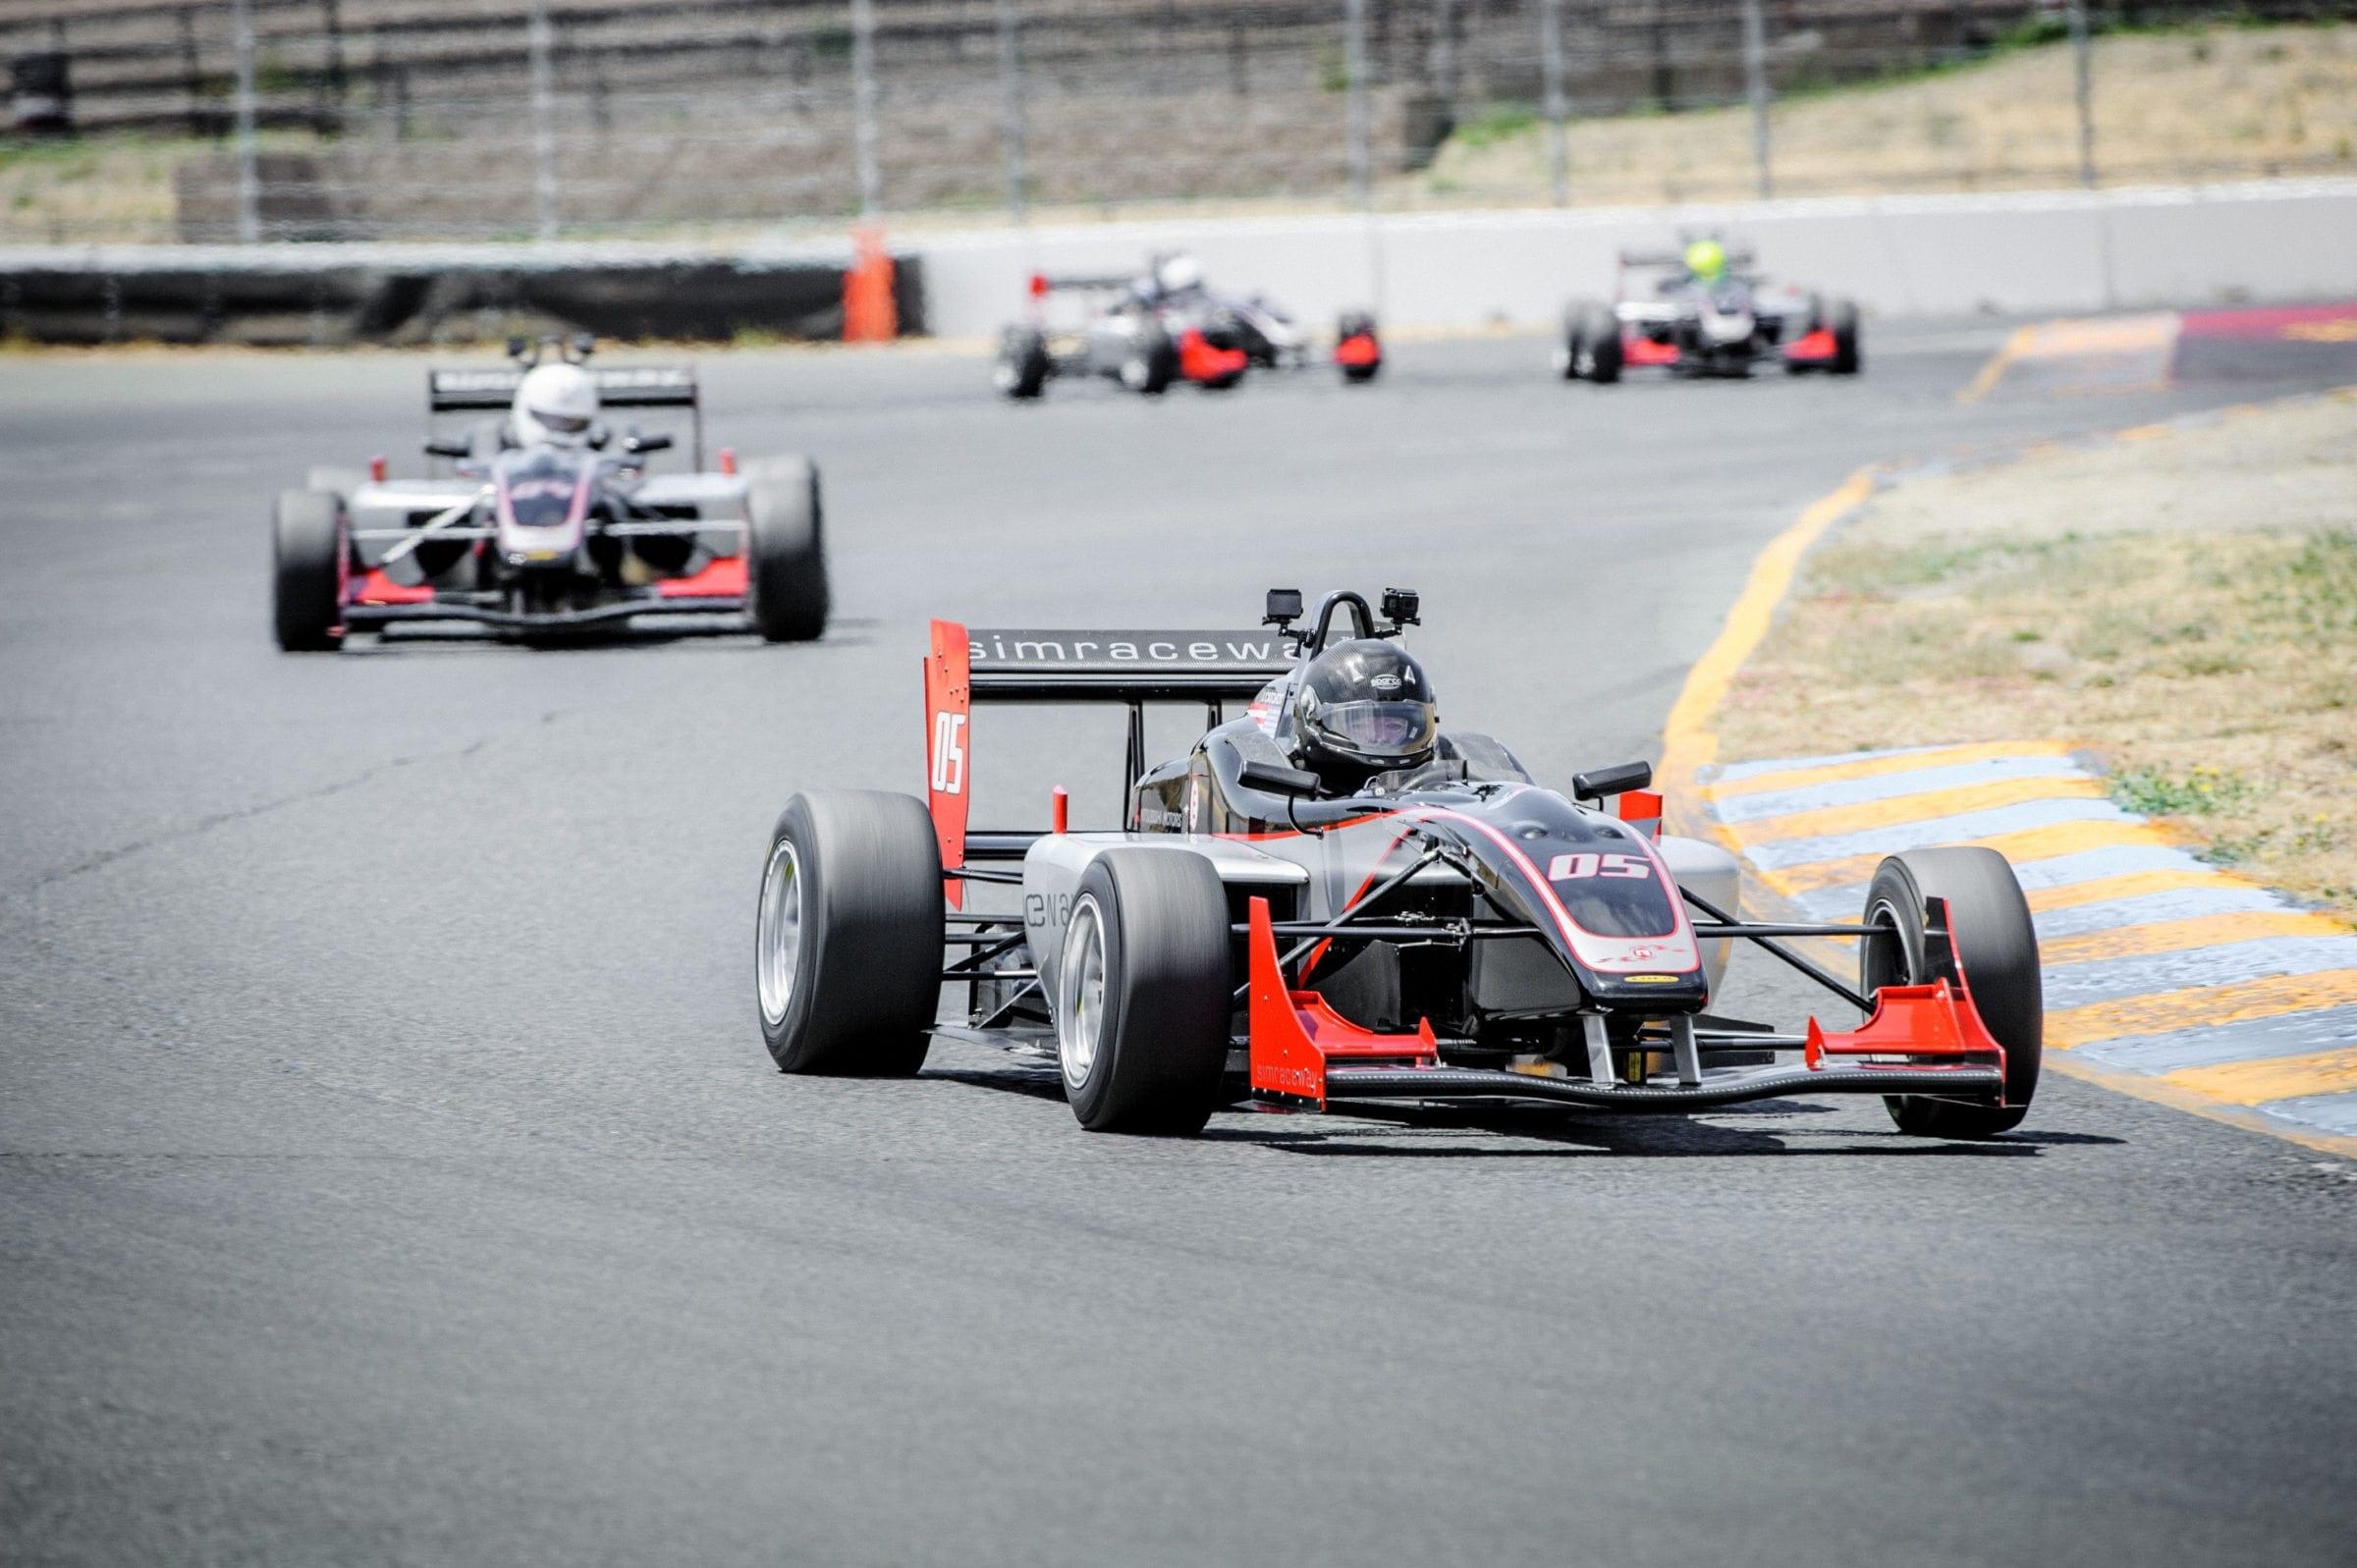 Jim Russell F3 Racing Series - Race 8_140713_2109-3384271738-O_140713_3236-3384287709-O